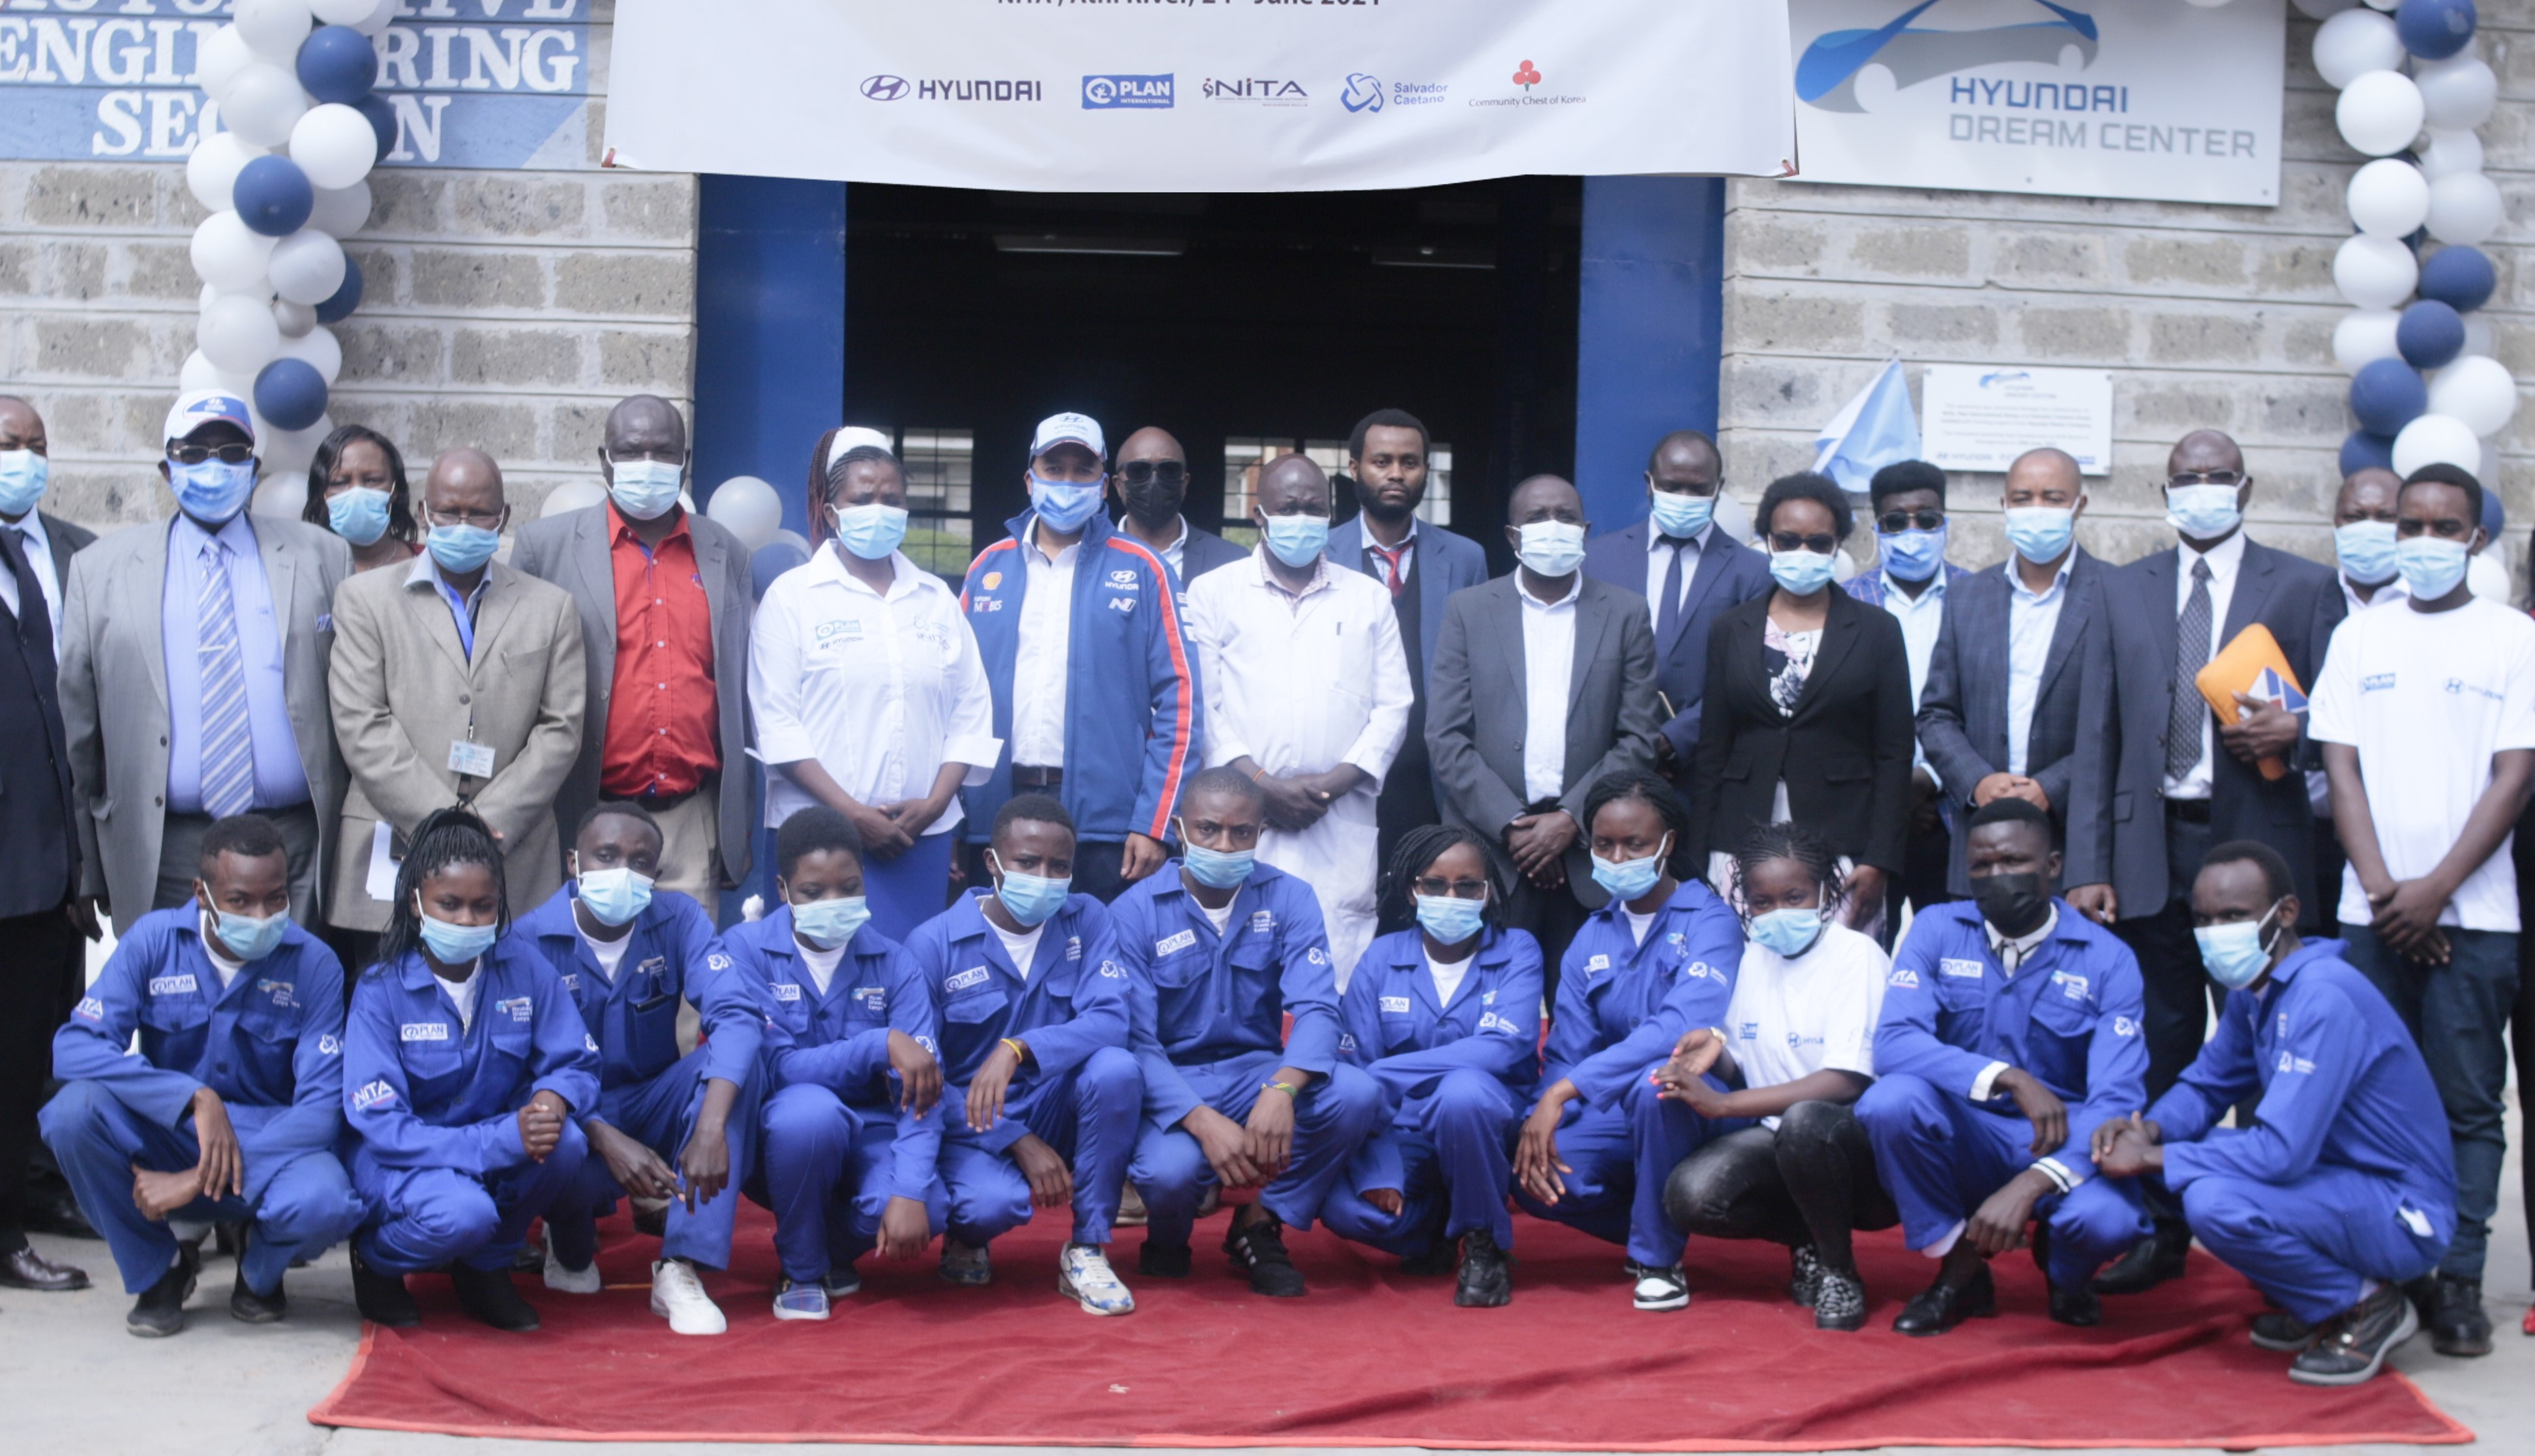 Hyundai Motor Opens Global Hyundai Dream Center in Kenya for Automotive Training and Education